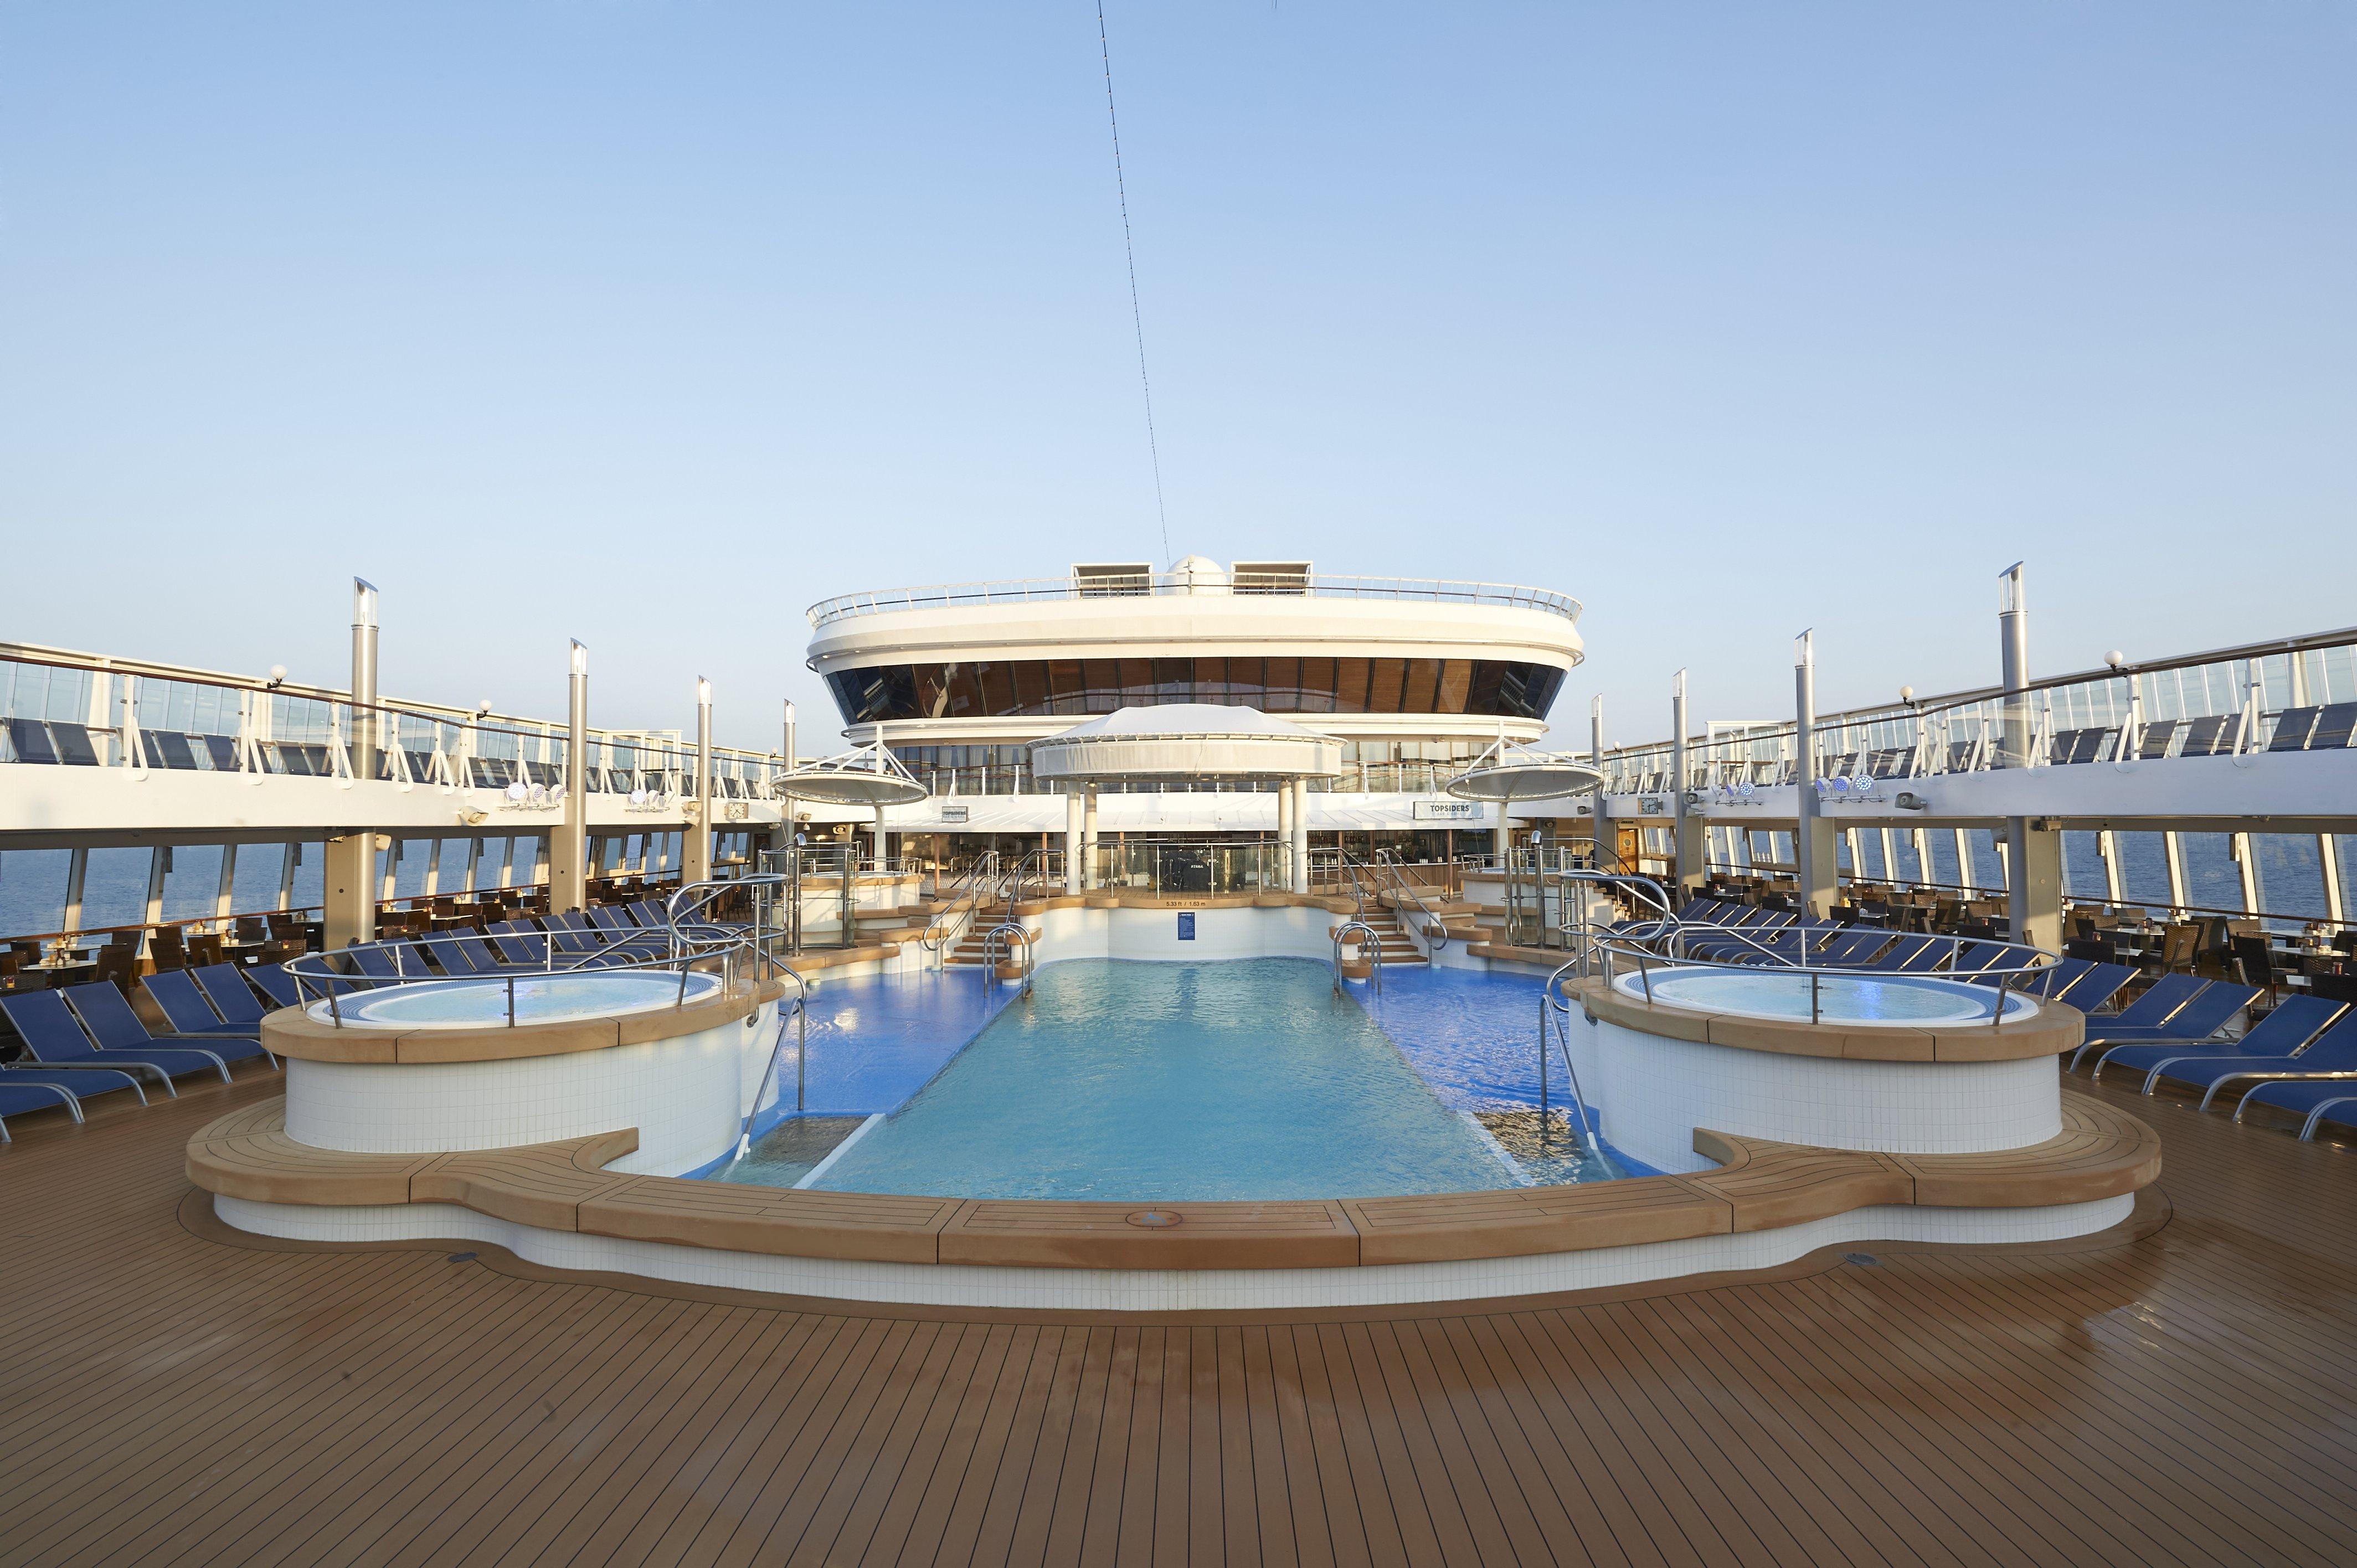 Norwegian Star Pool Deck.jpeg